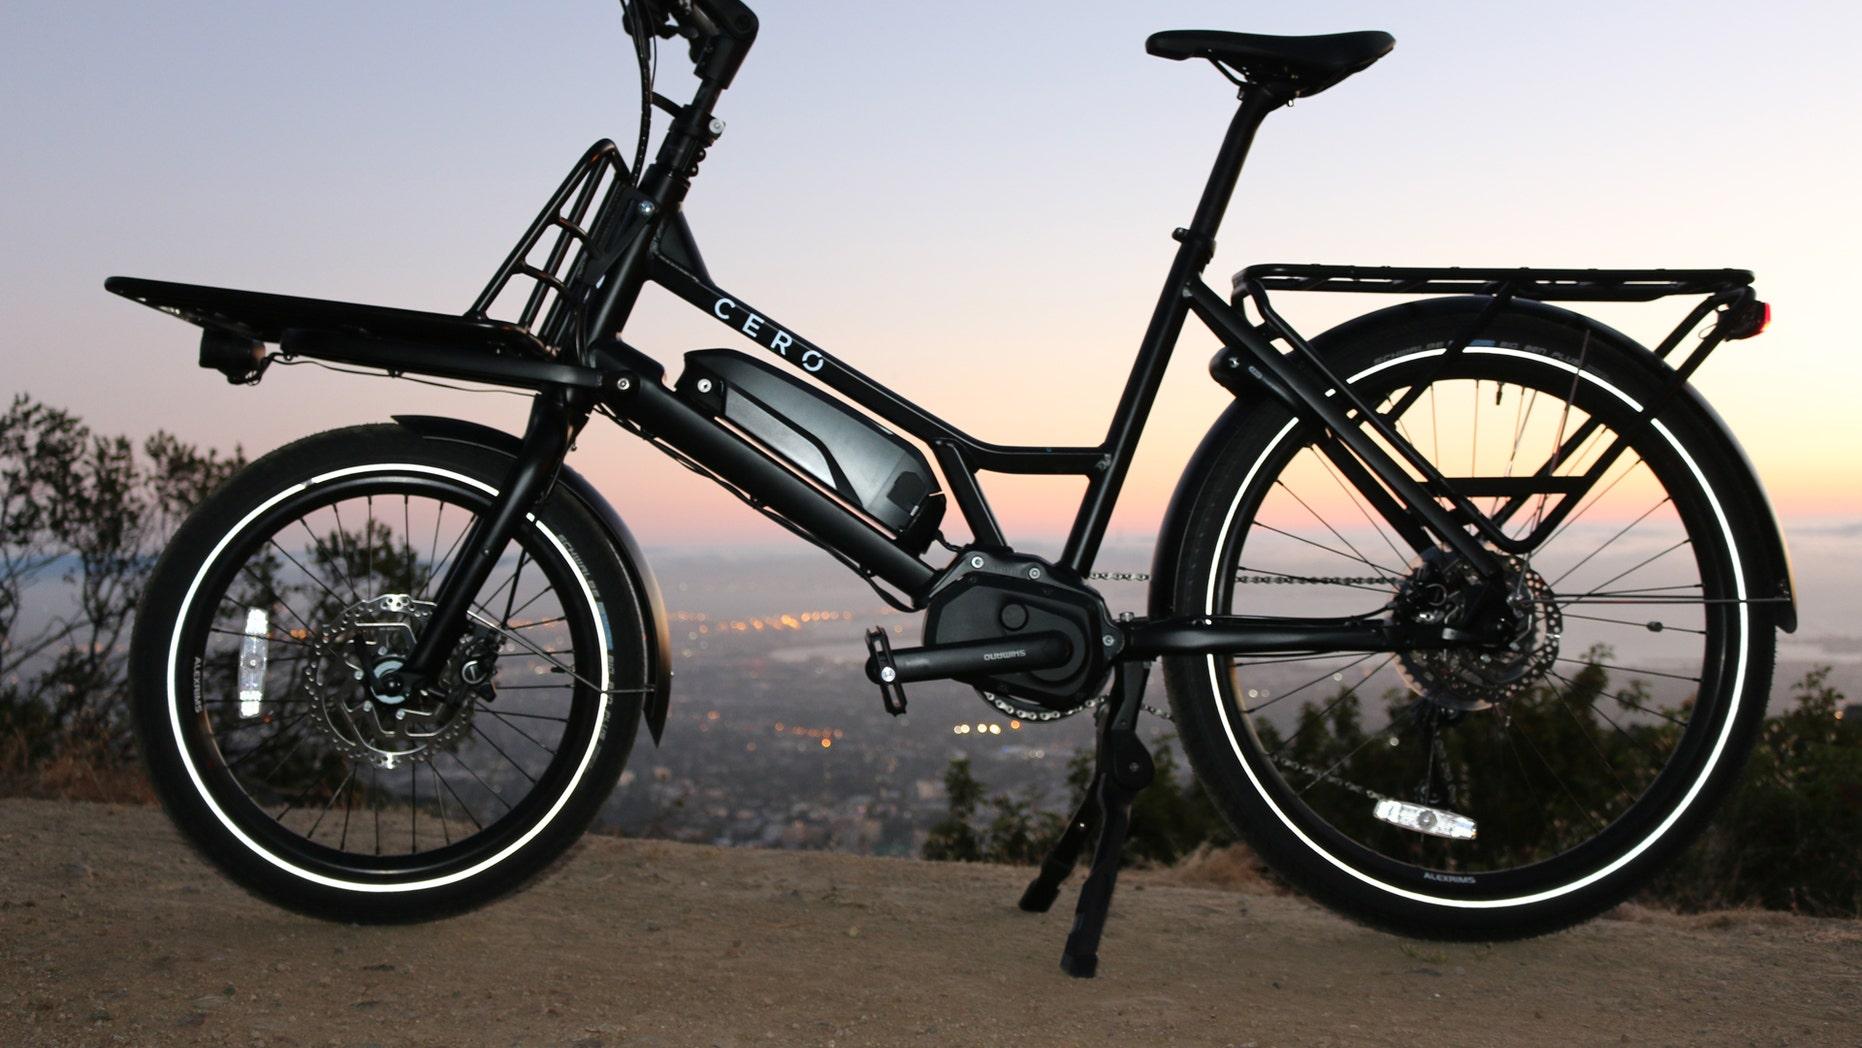 Cero One bike (Credit: Cero)